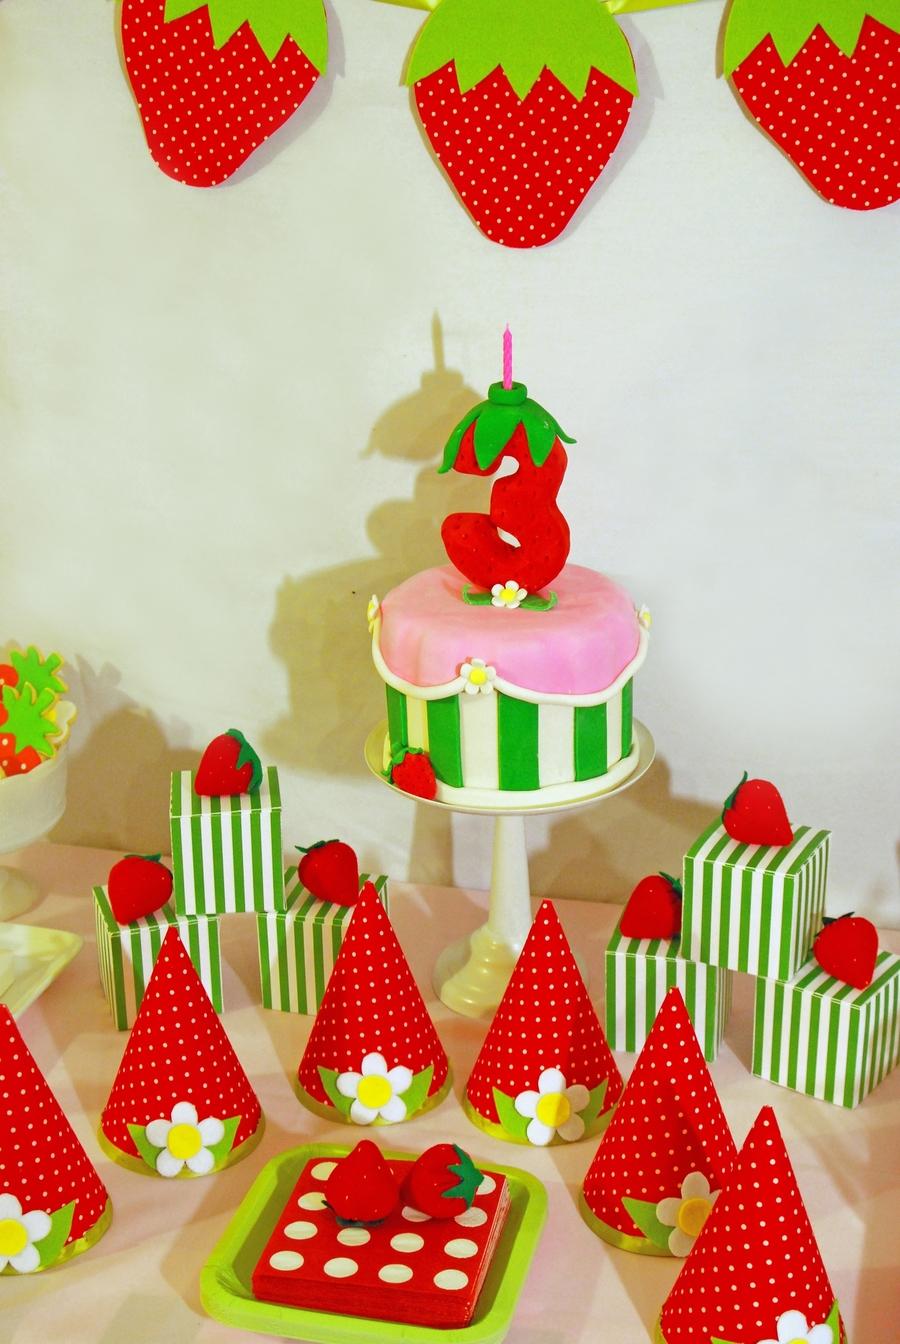 Strawberry Shortcake Birthday Cake And Dessert Table